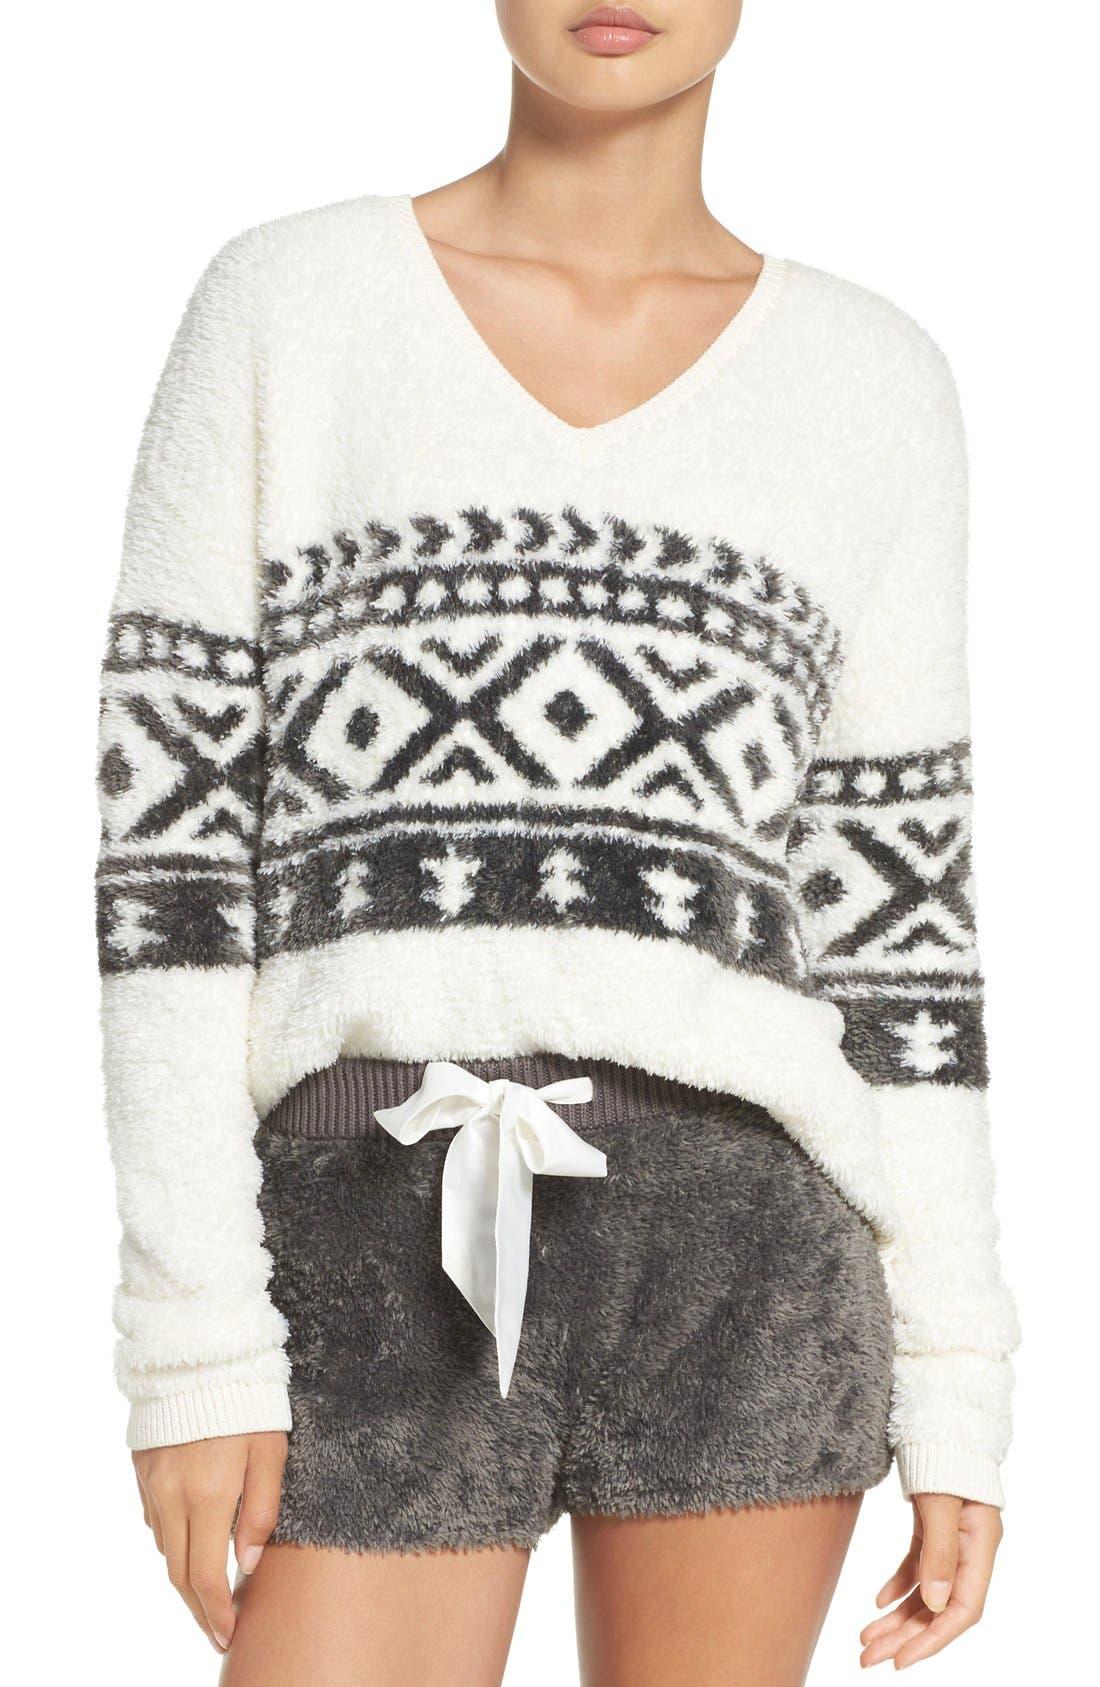 Alternate Image 1 Selected - Make + Model Fuzzy Lounge Sweater